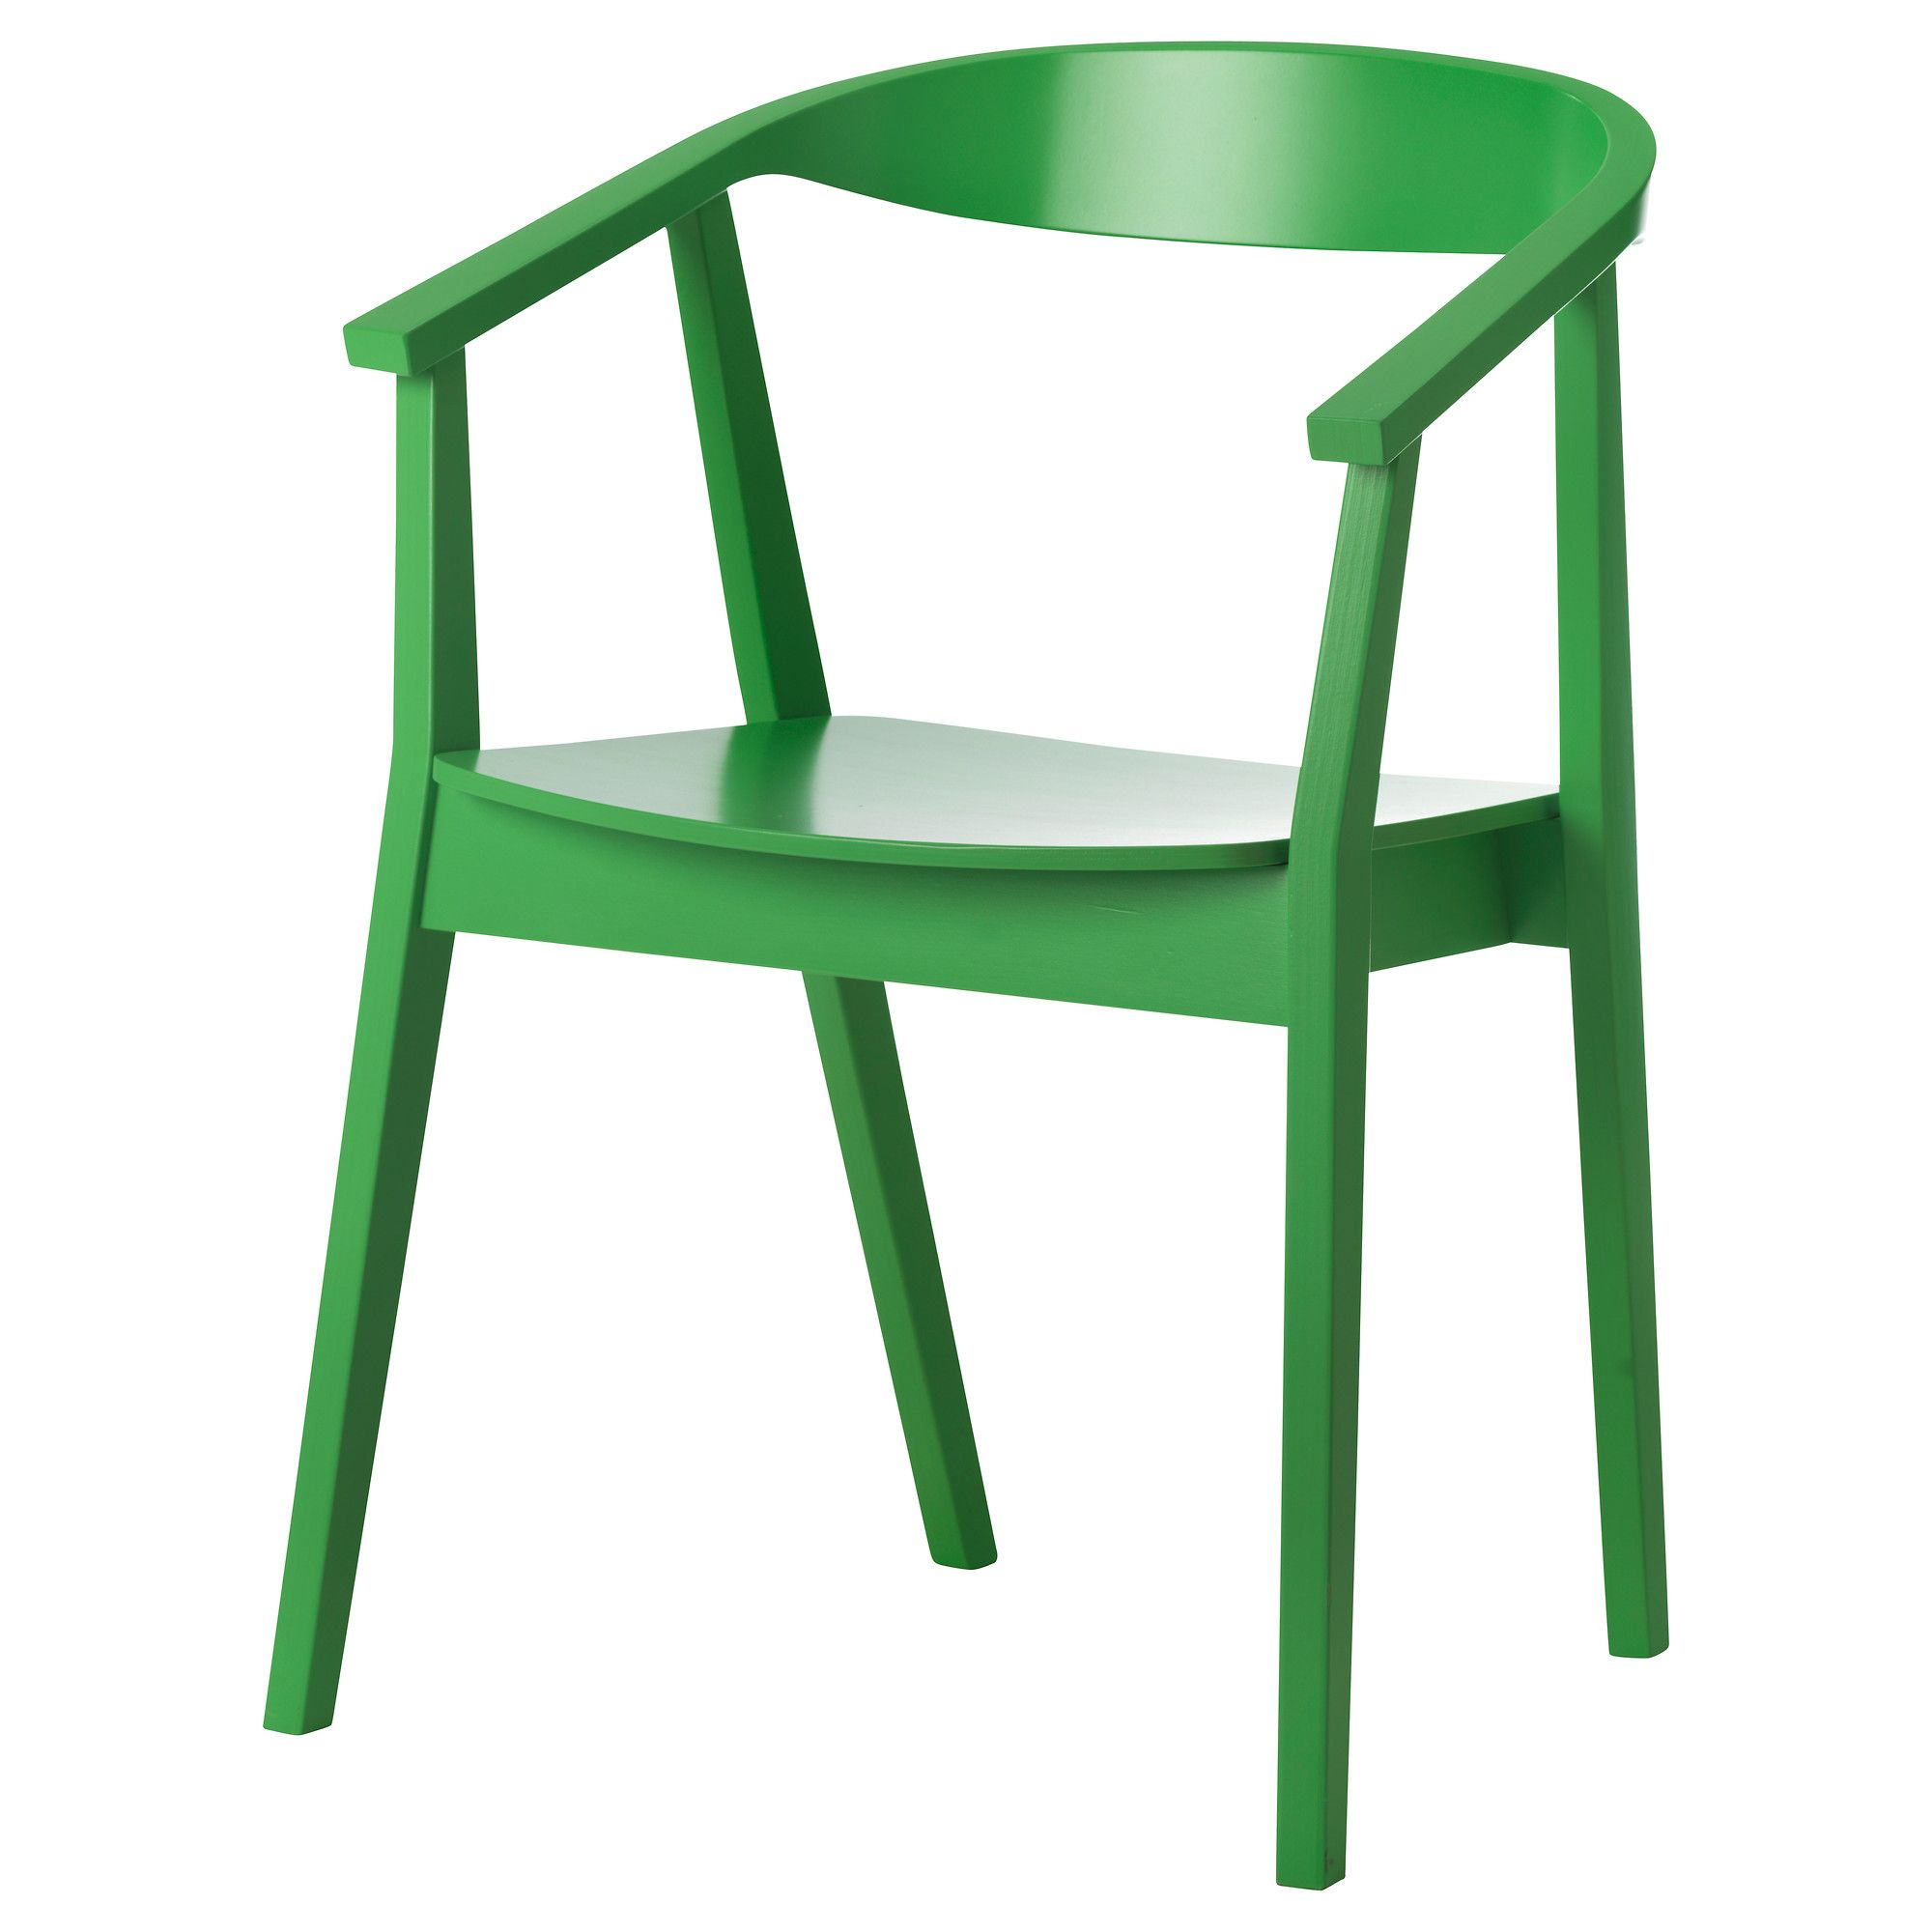 stockholm stuhl gr n ikea all things green gr n pinterest stuhl gr n stockholm und ikea. Black Bedroom Furniture Sets. Home Design Ideas